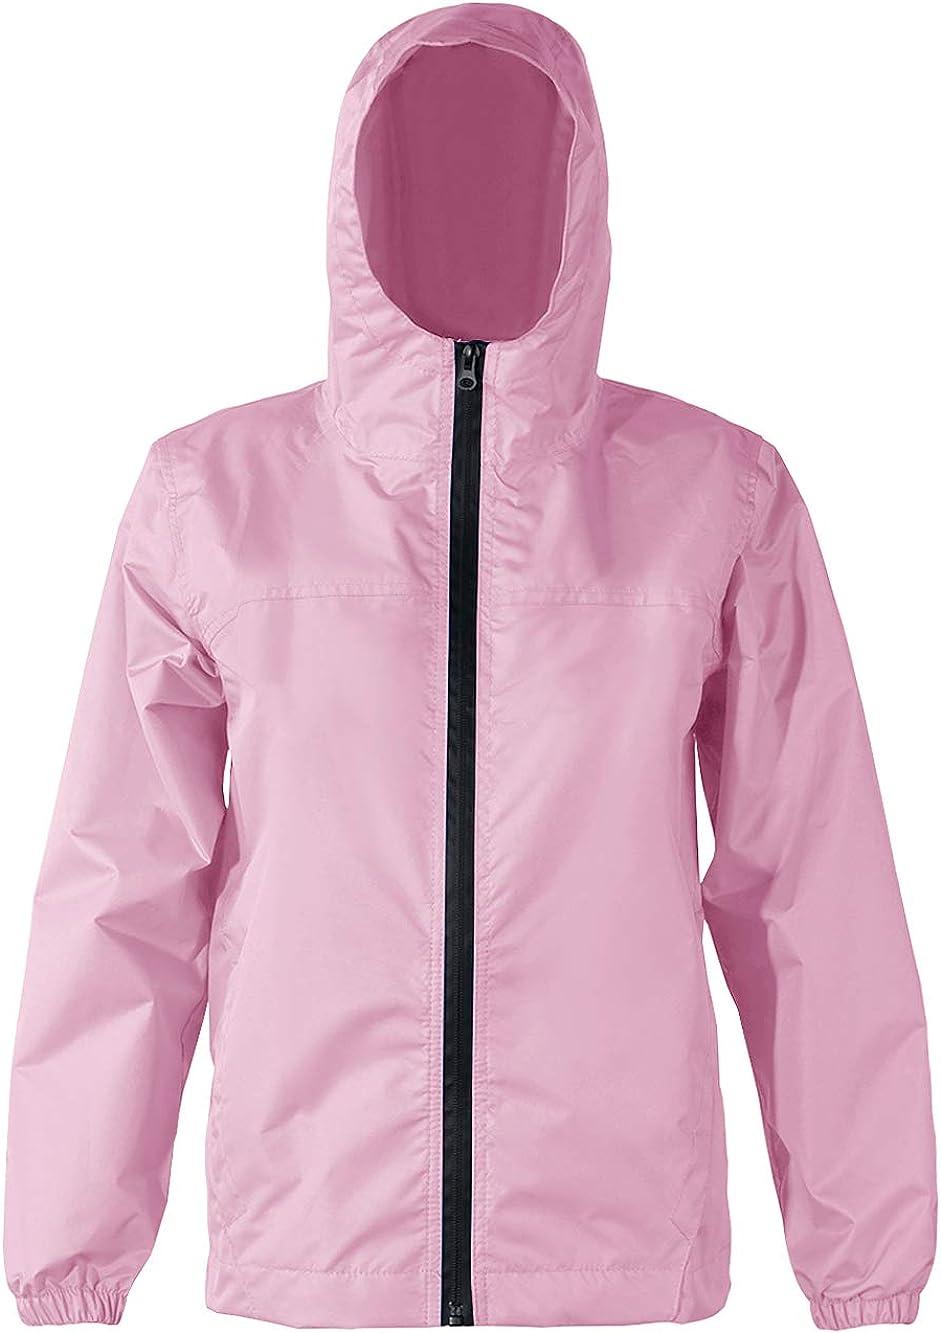 Kids Rain Jacket Waterproof Raincoats with Pockets